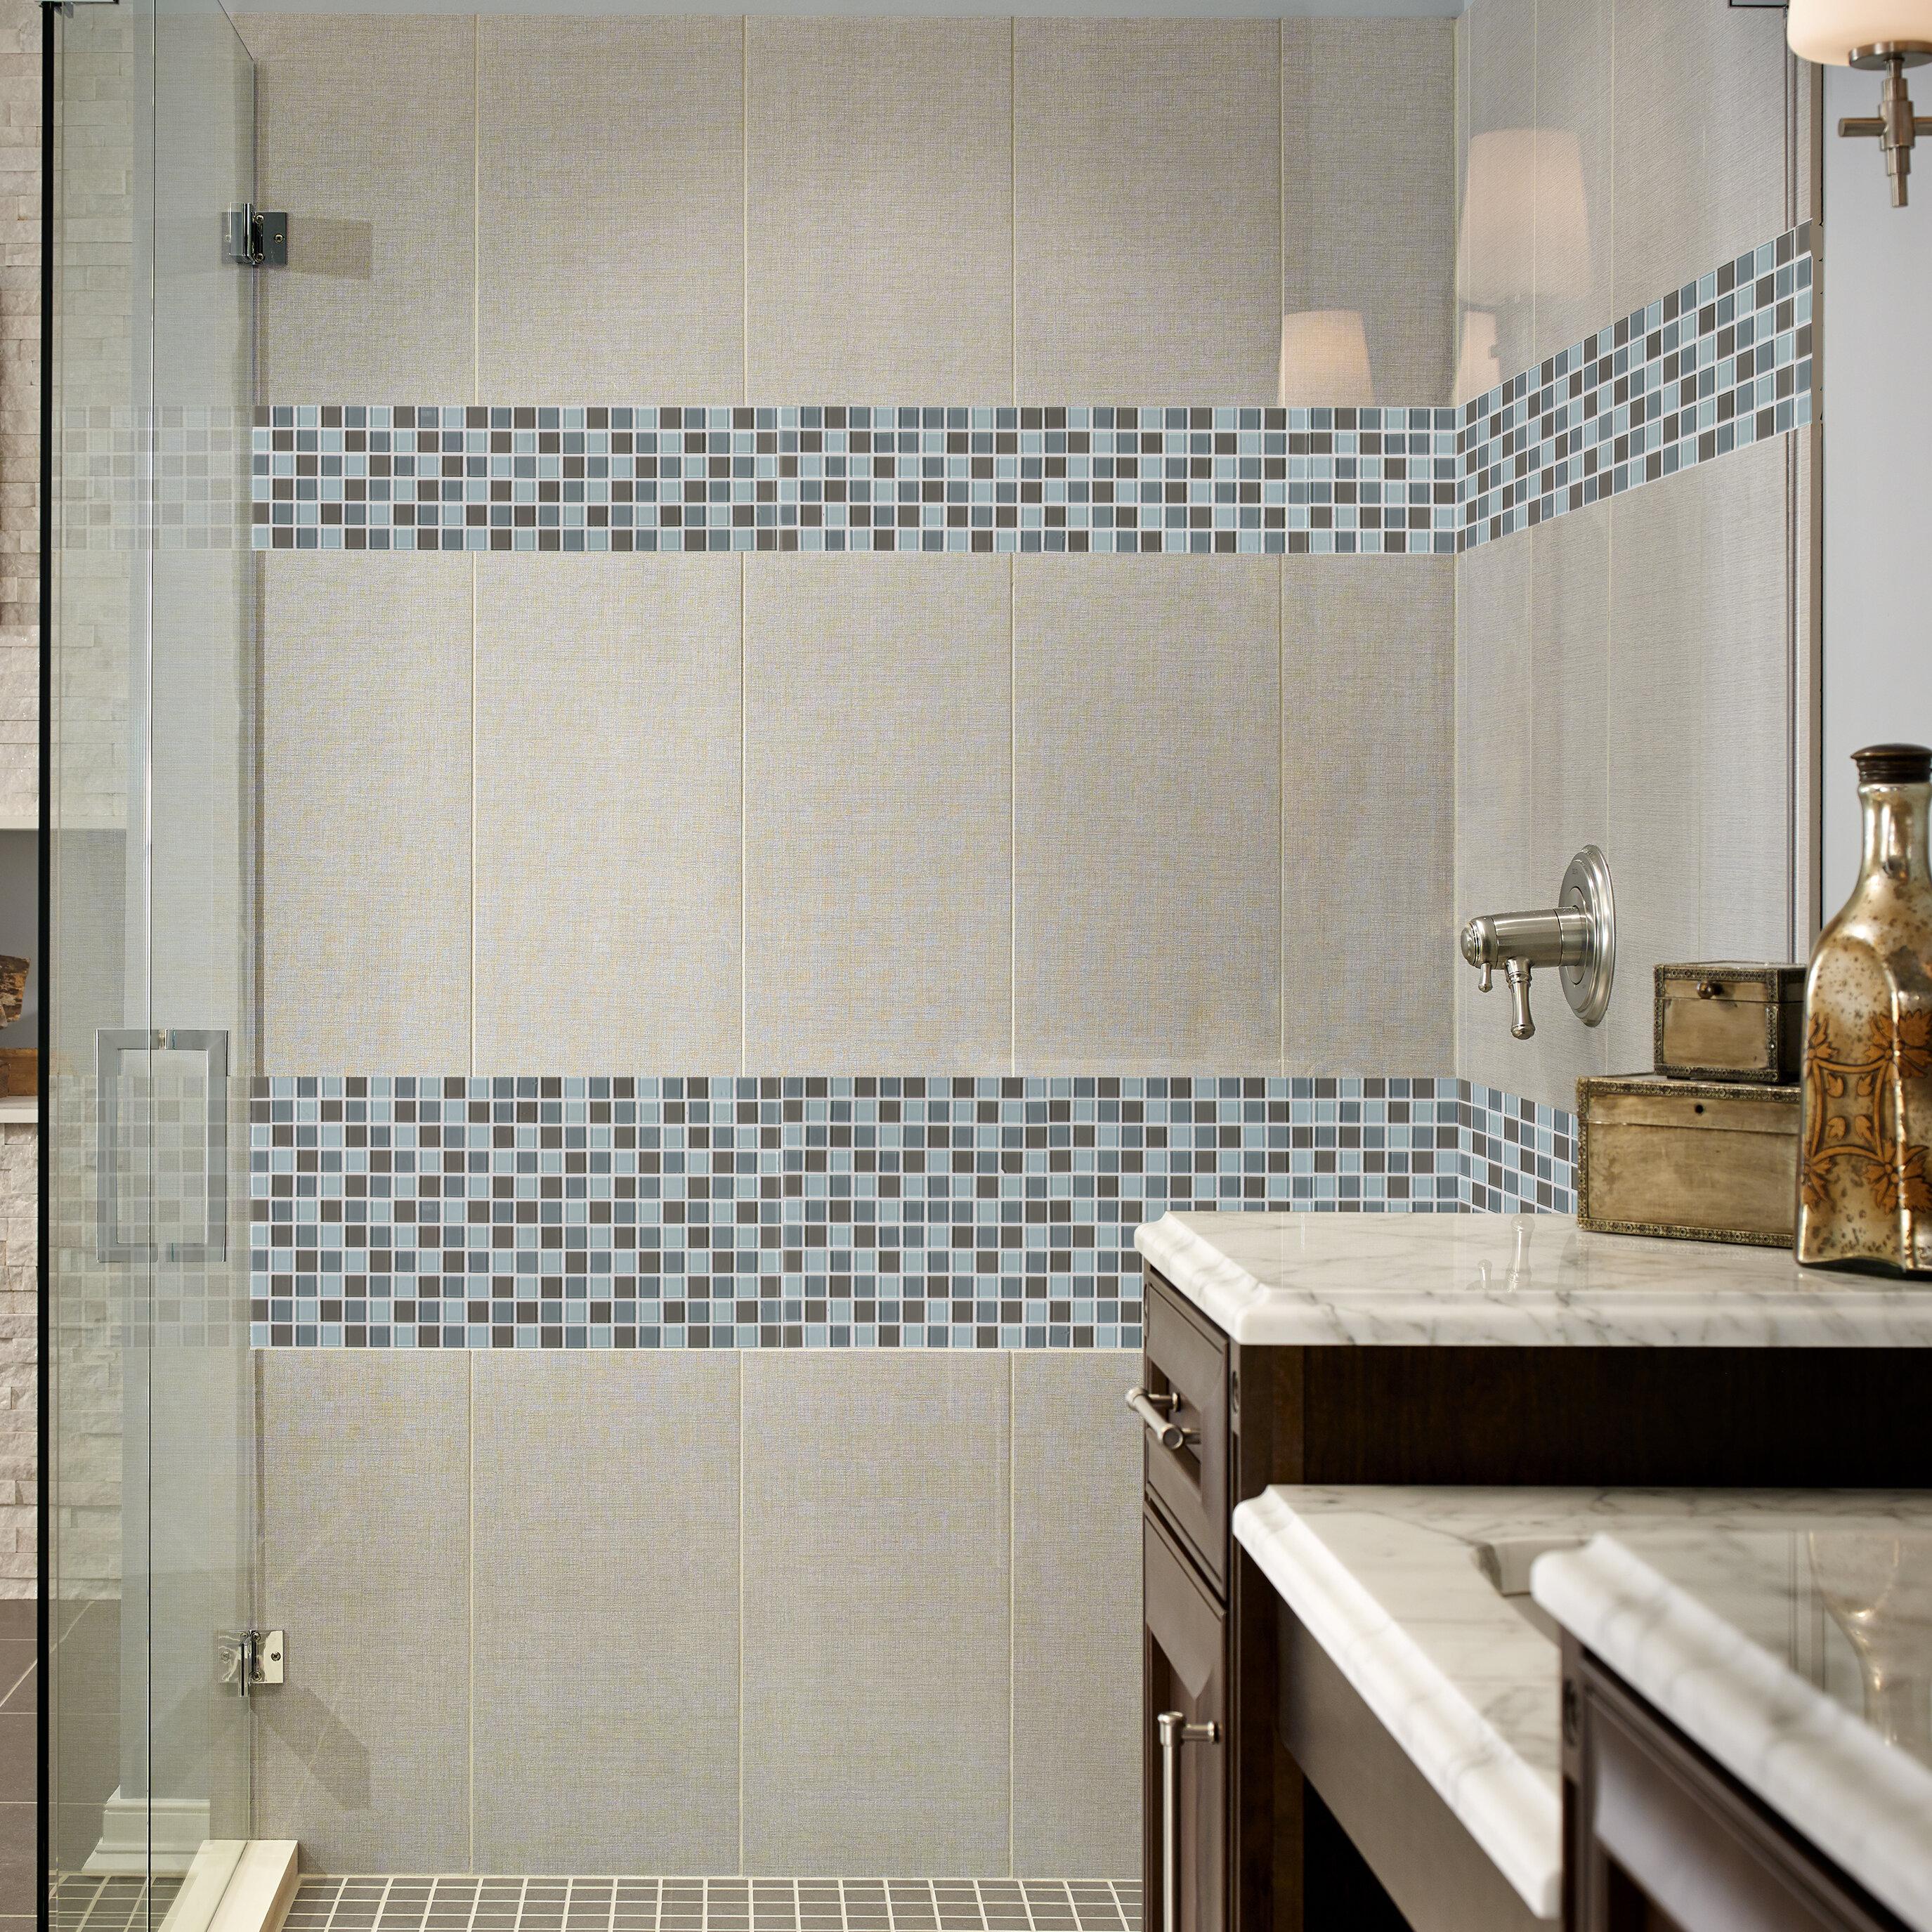 Msi Majestic Ocean 1 X 1 Mosaic Tile In White Reviews Wayfair